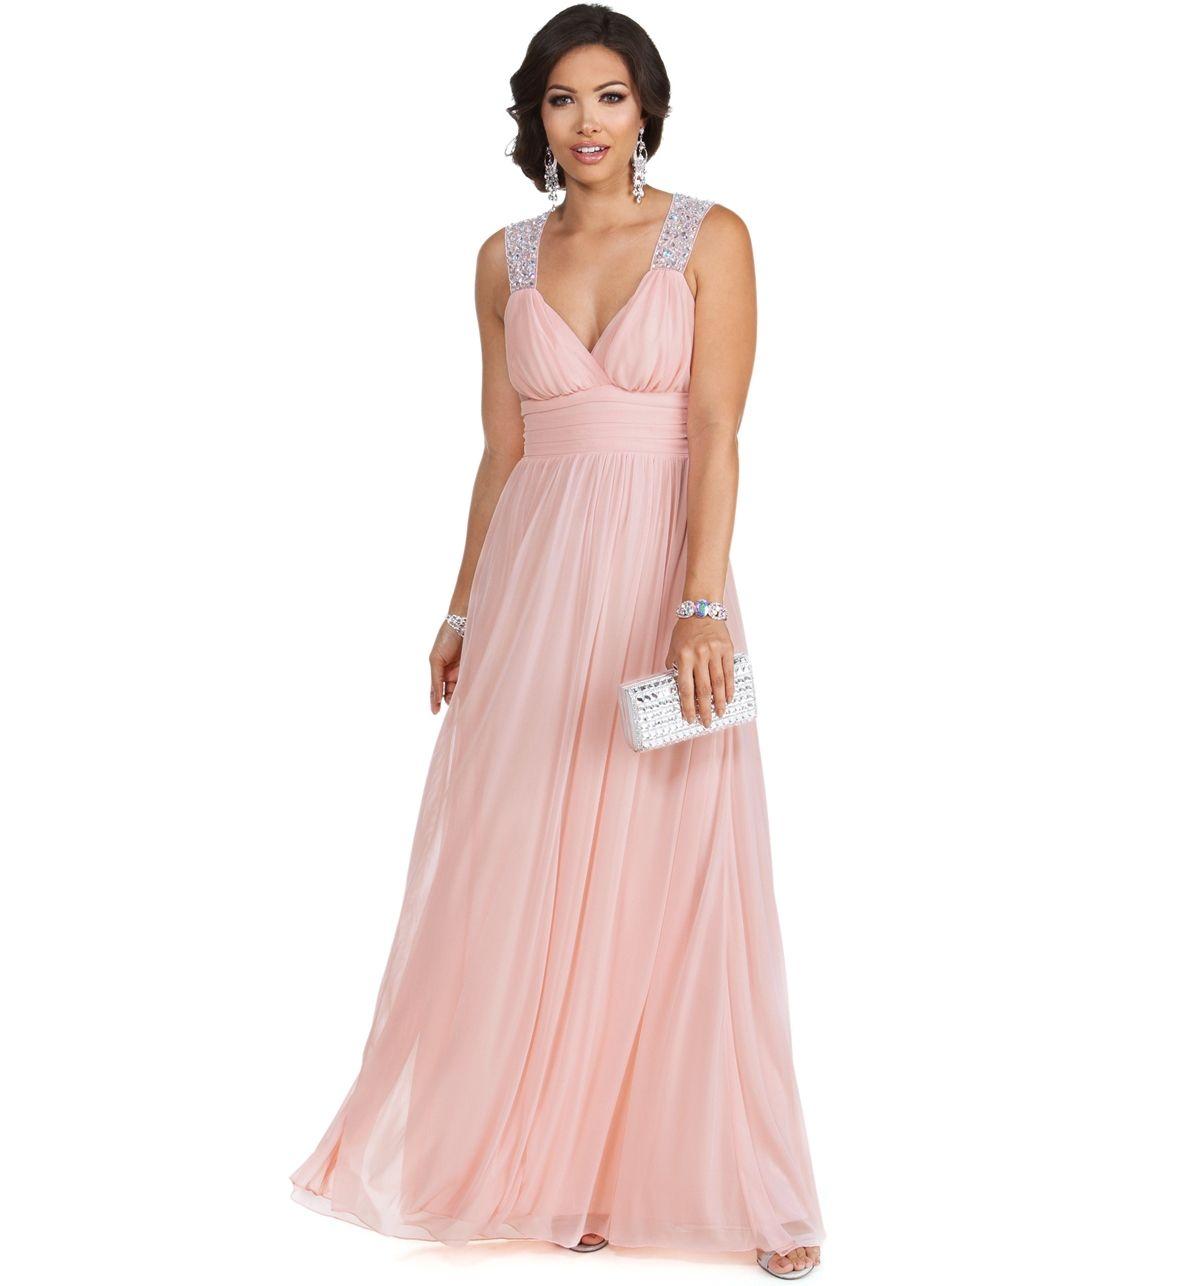 Großzügig Prom Kleid Windsor Galerie - Brautkleider Ideen ...